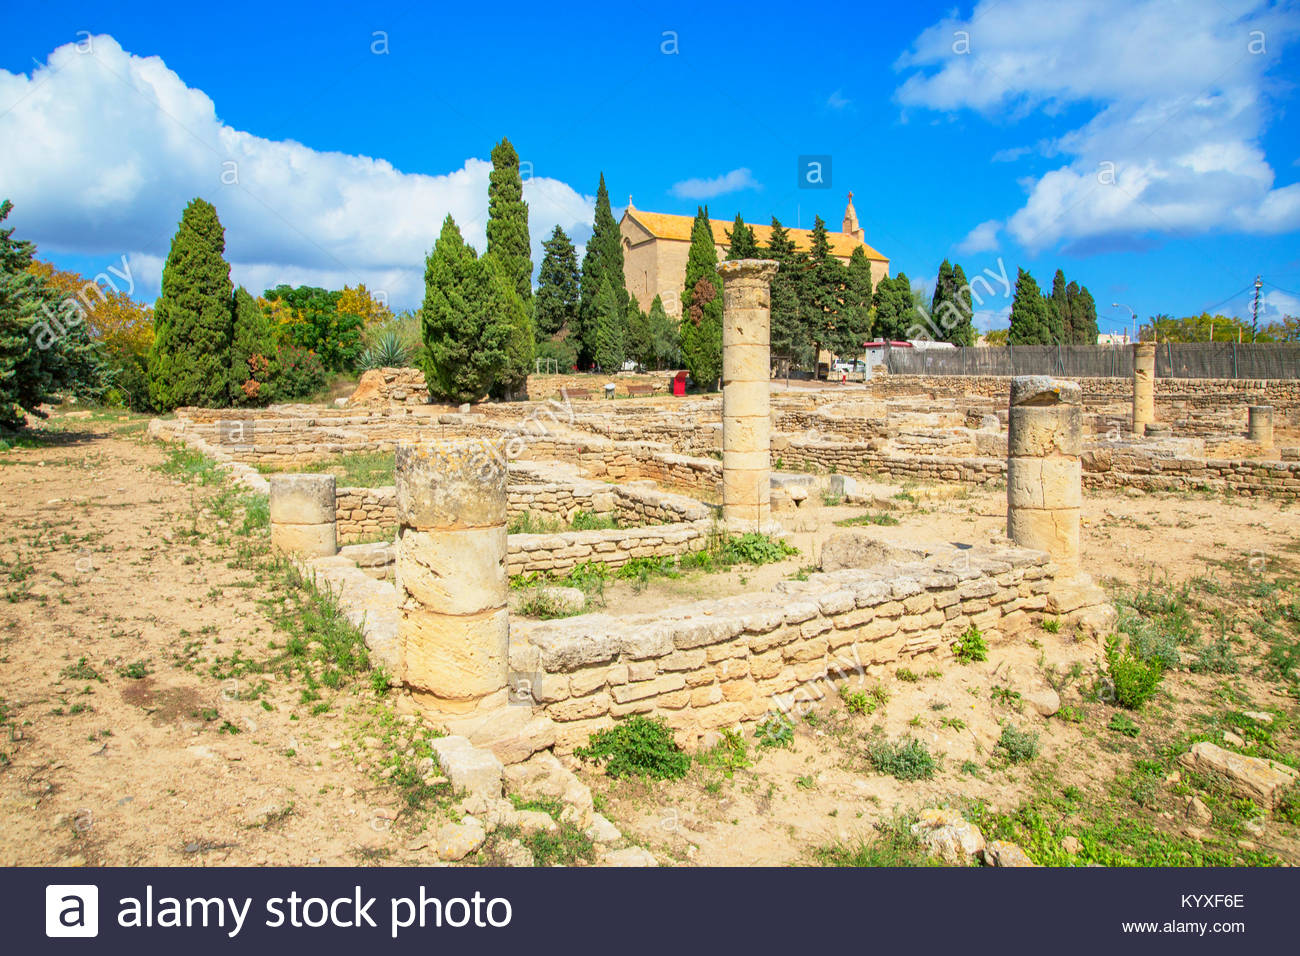 Pollentia rovine romane, Alcudia Maiorca, isole Baleari, Spagna, Europa Immagini Stock